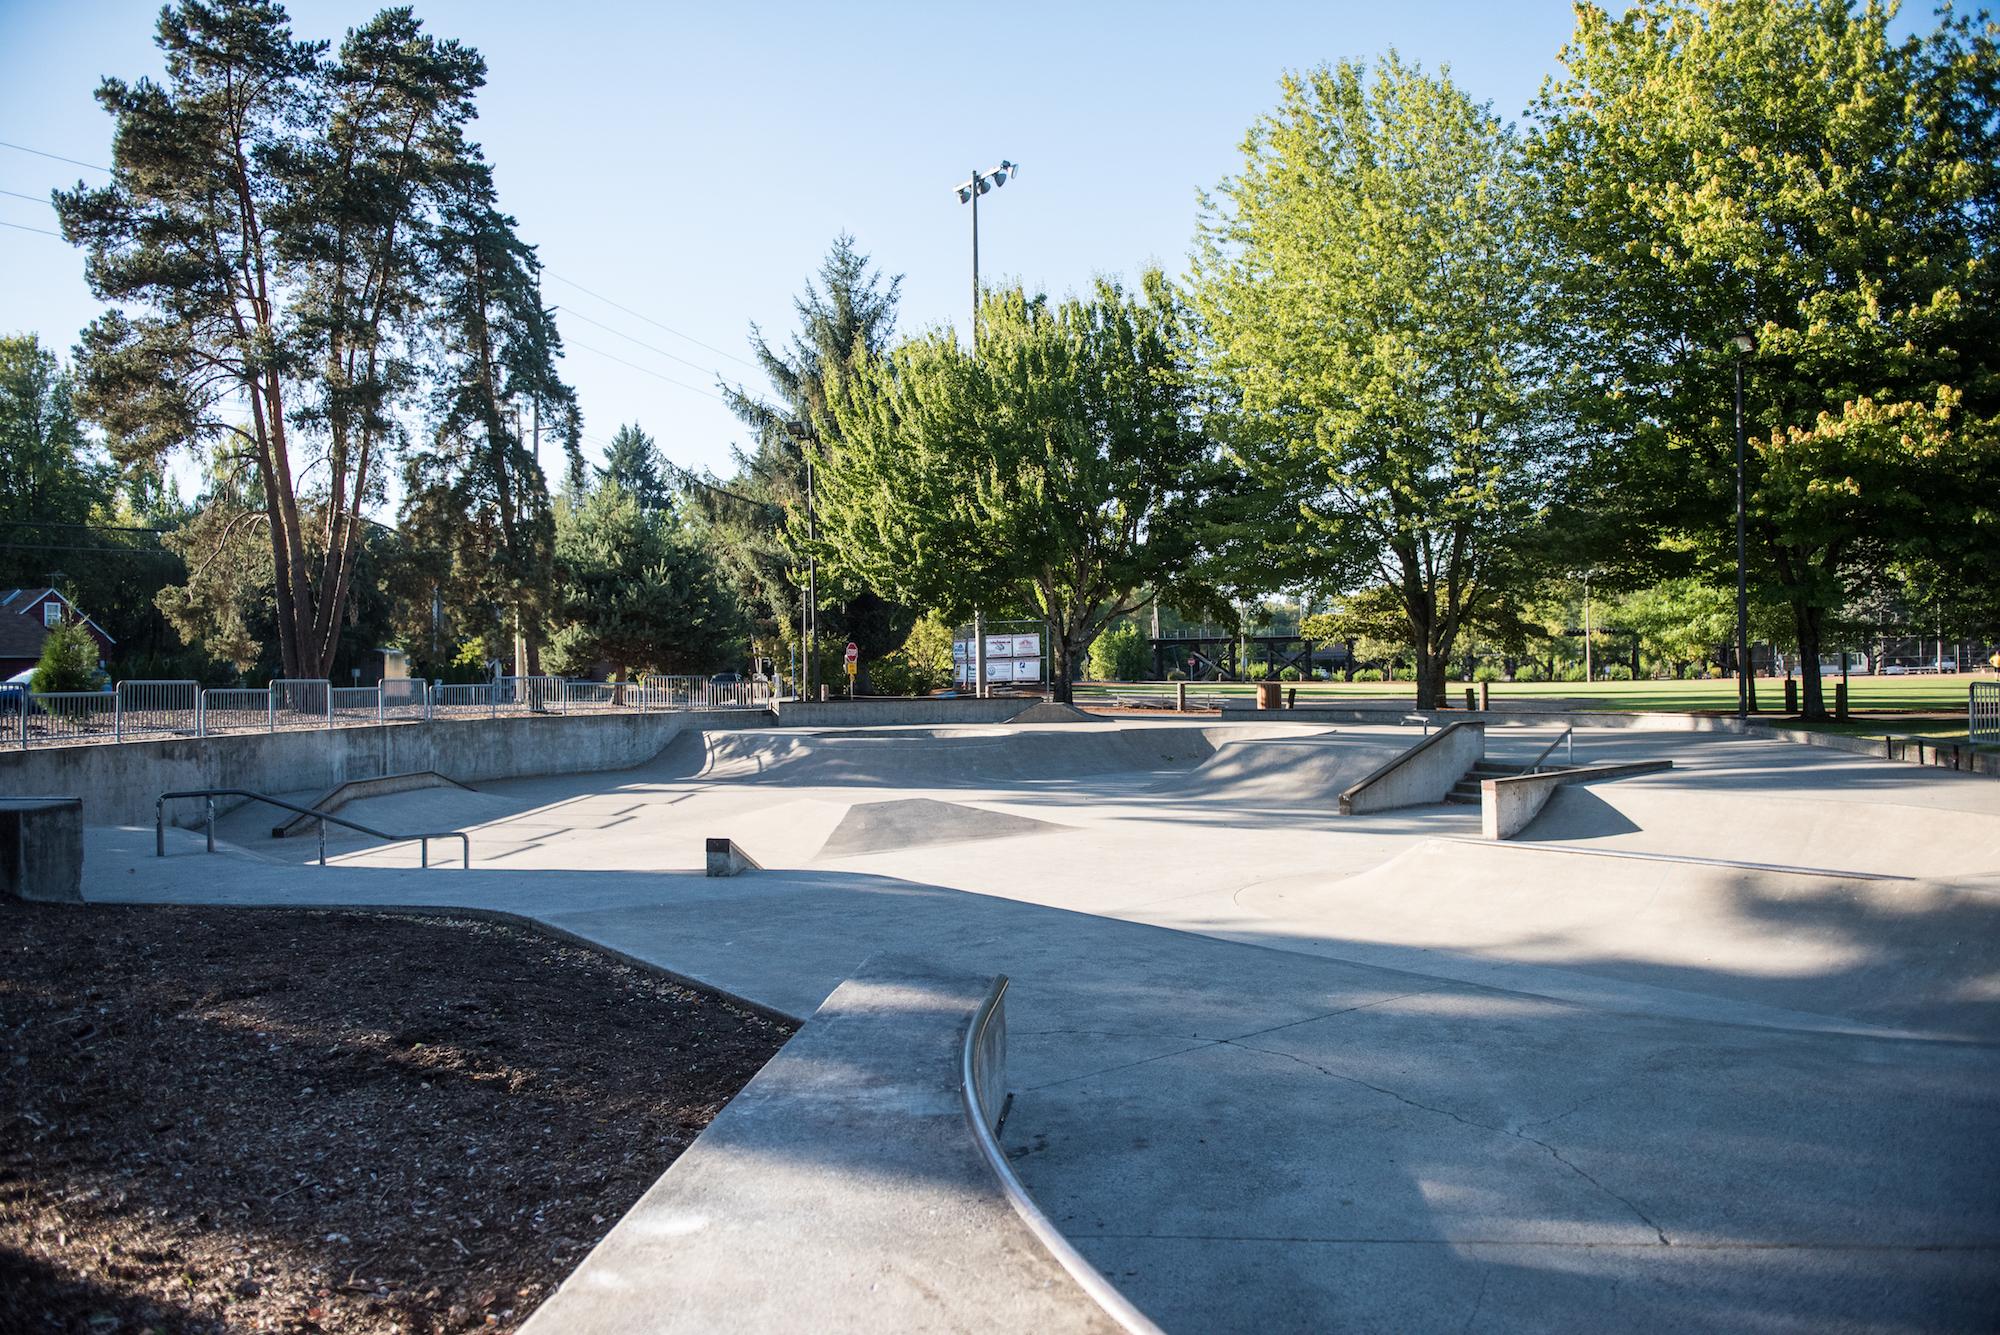 Tualatin Skate Park